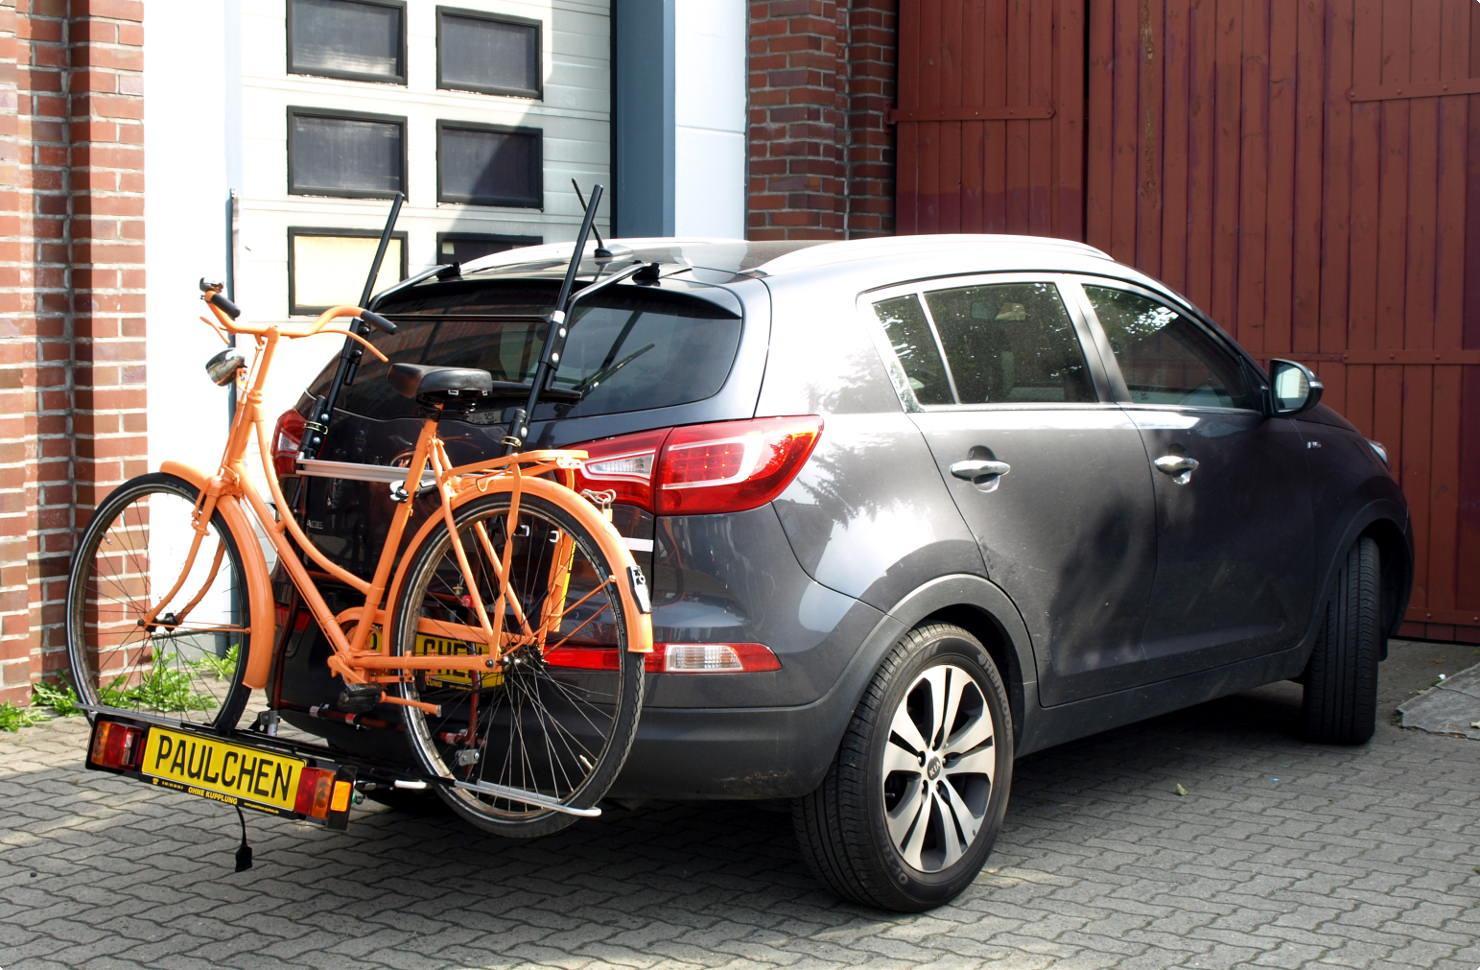 Hitch Bike Rack Reviews >> Bicycle carrier for Kia Sportage III (SL) - Paulchen Heckträger System | Fahrradträger